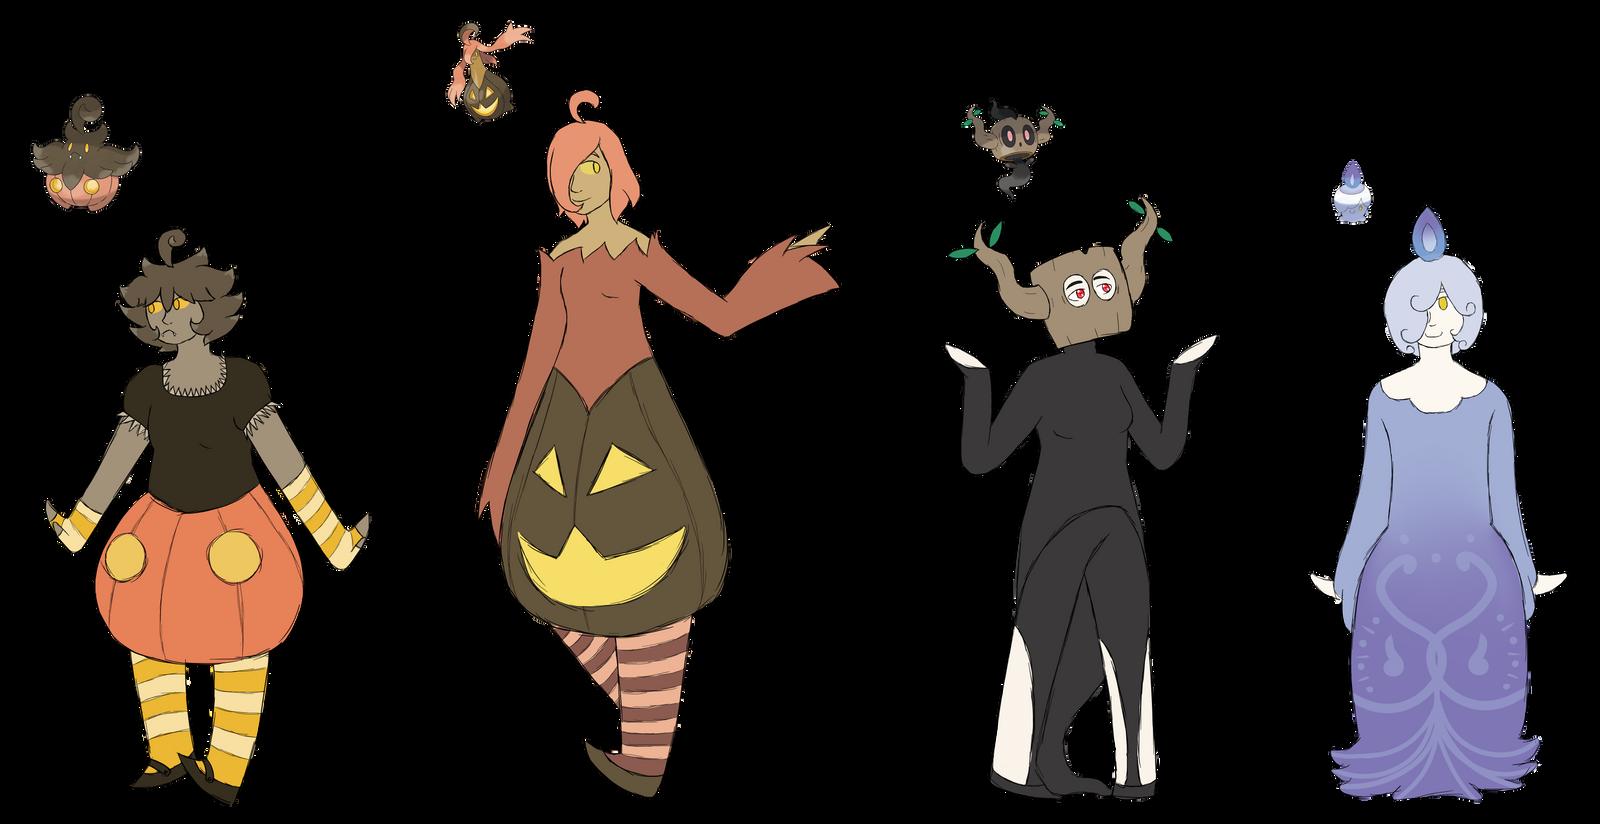 Some Ghost Type Gijinka Designs By Theflyingshark